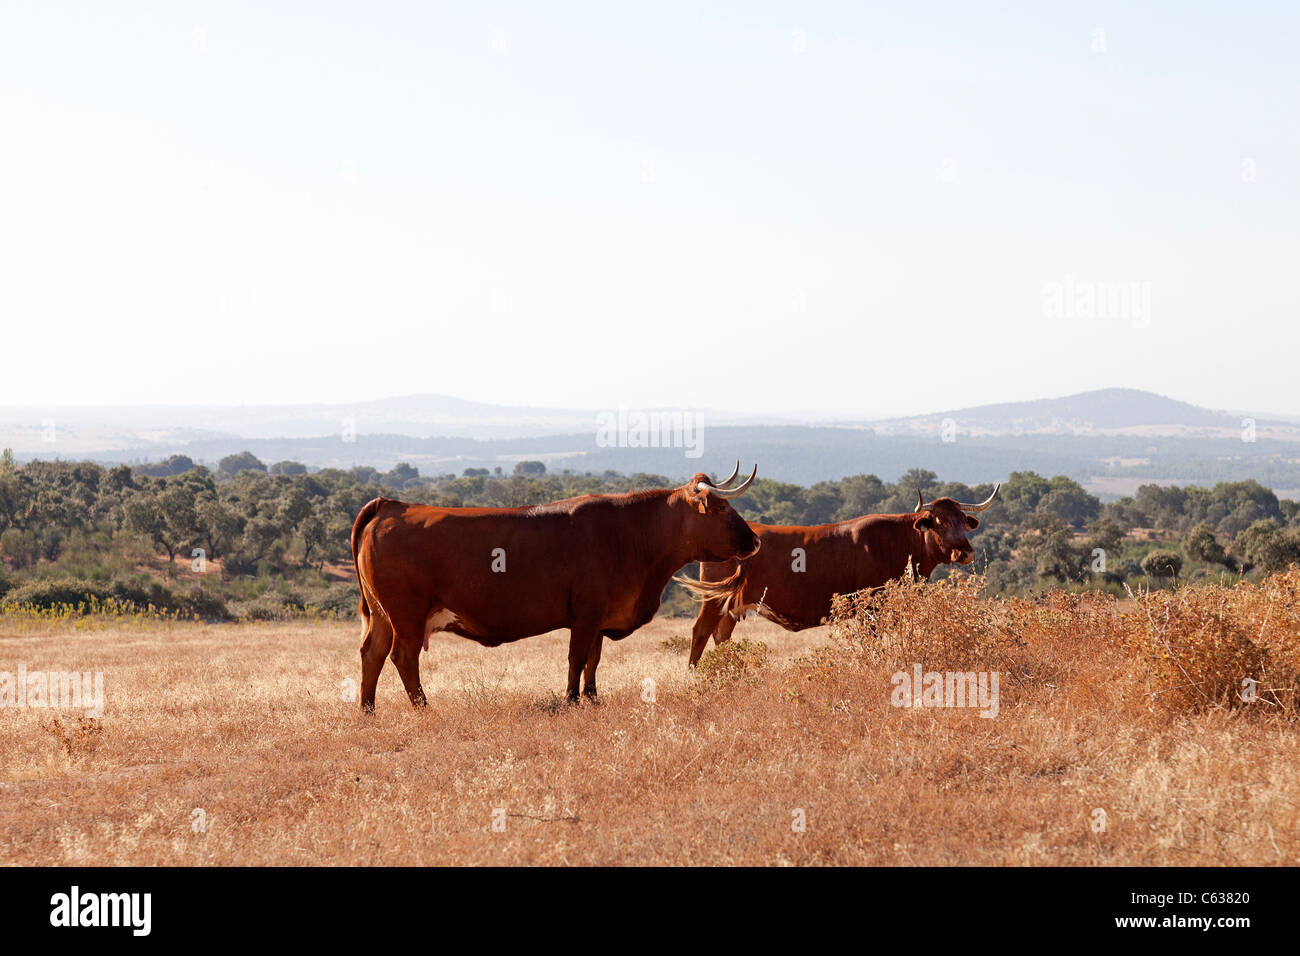 Las vacas de la raza alentejana (Raça Alentejana) en la provincia de Alentejo. Distrito de Portalegre, Portugal. Foto de stock